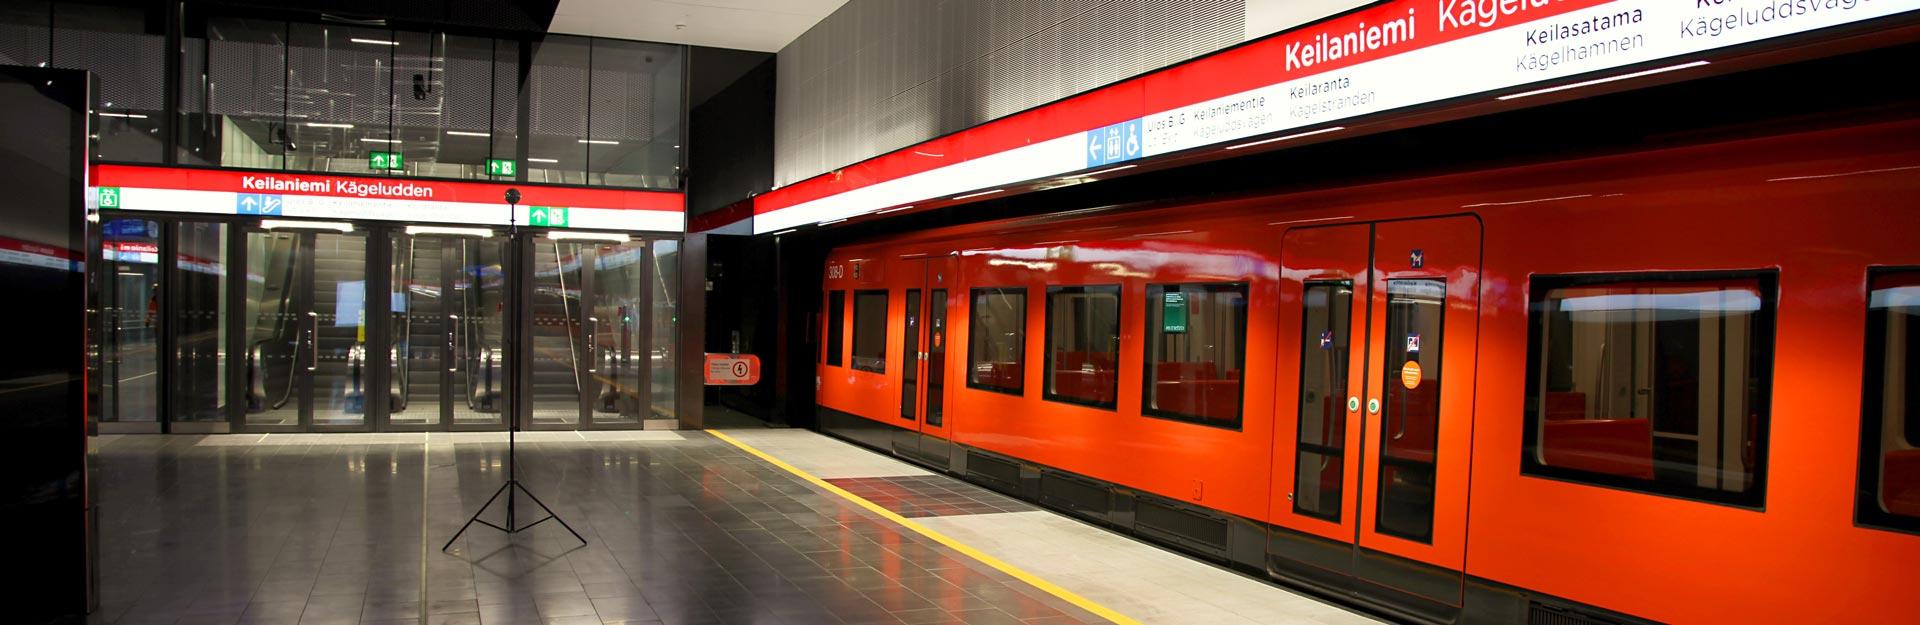 Metro seisoo Keilaniemen metroasemalla.